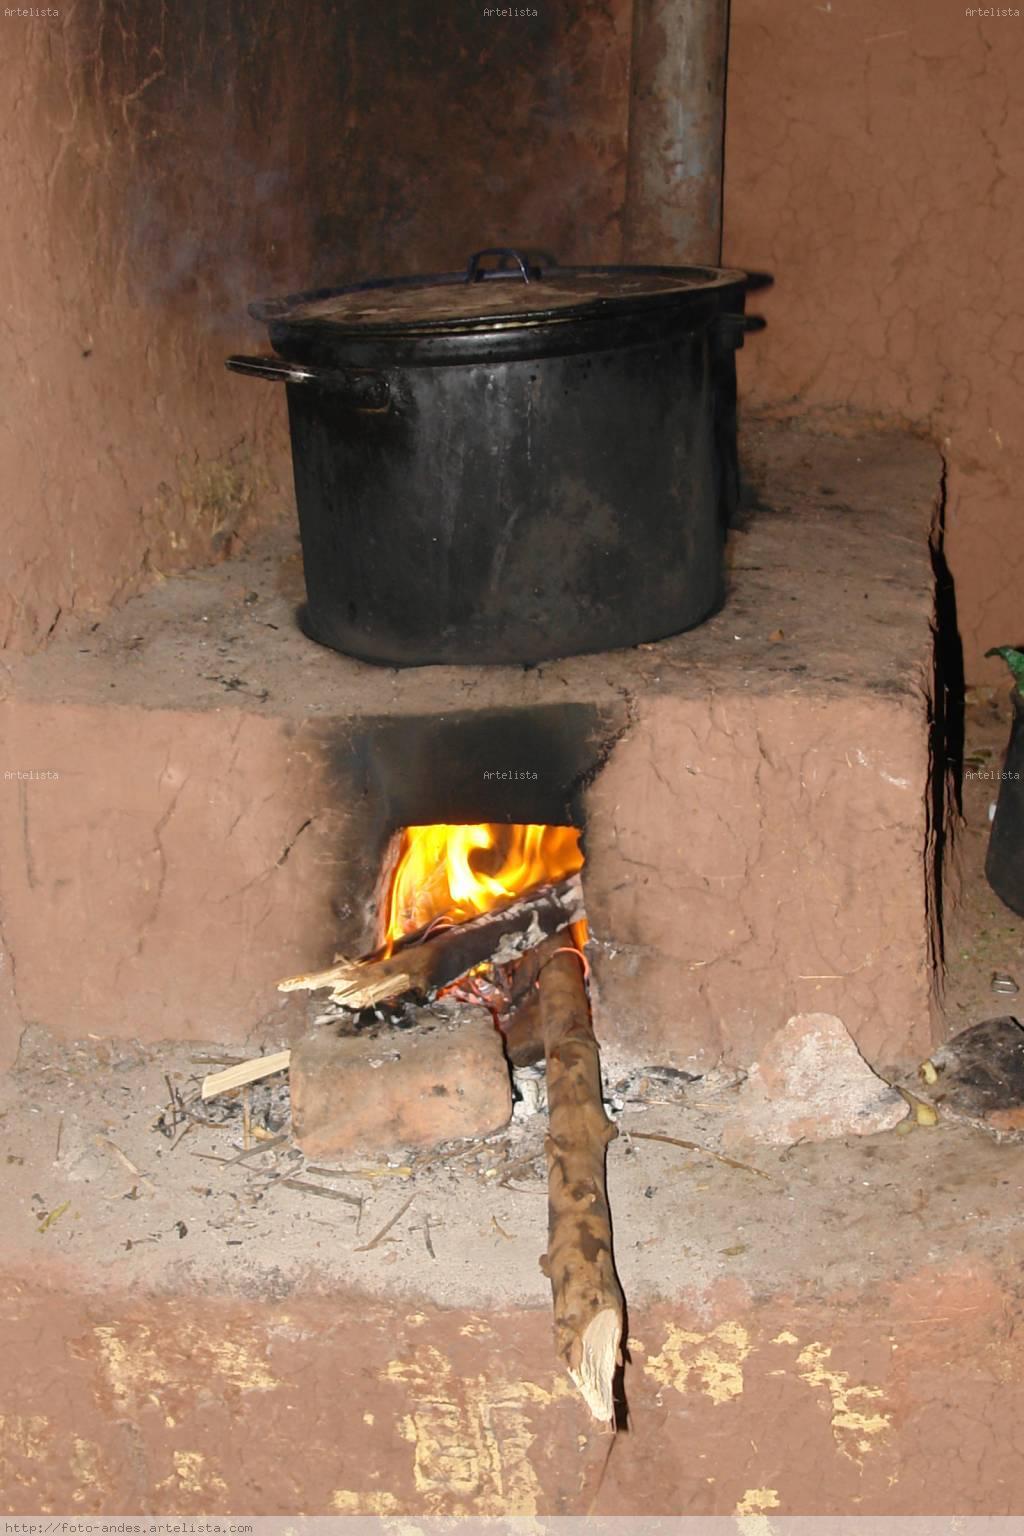 Cocina a le a ivan florez ojeda - Fotos de cocinas de lena antiguas ...